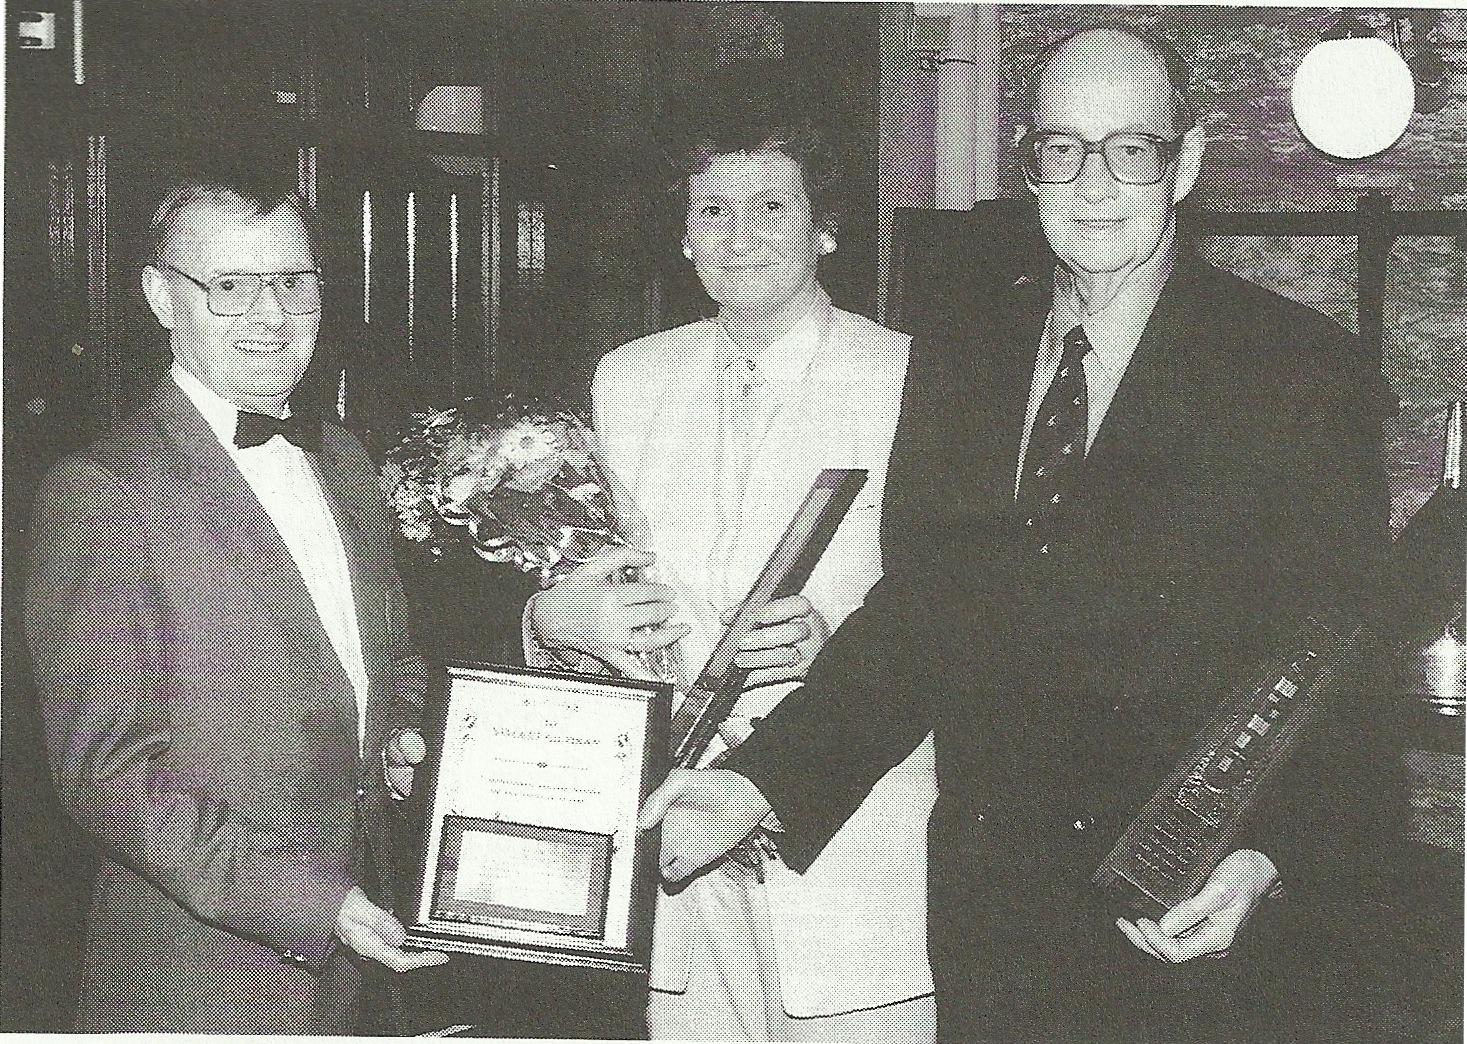 Honorary Member Vincent Giltinan